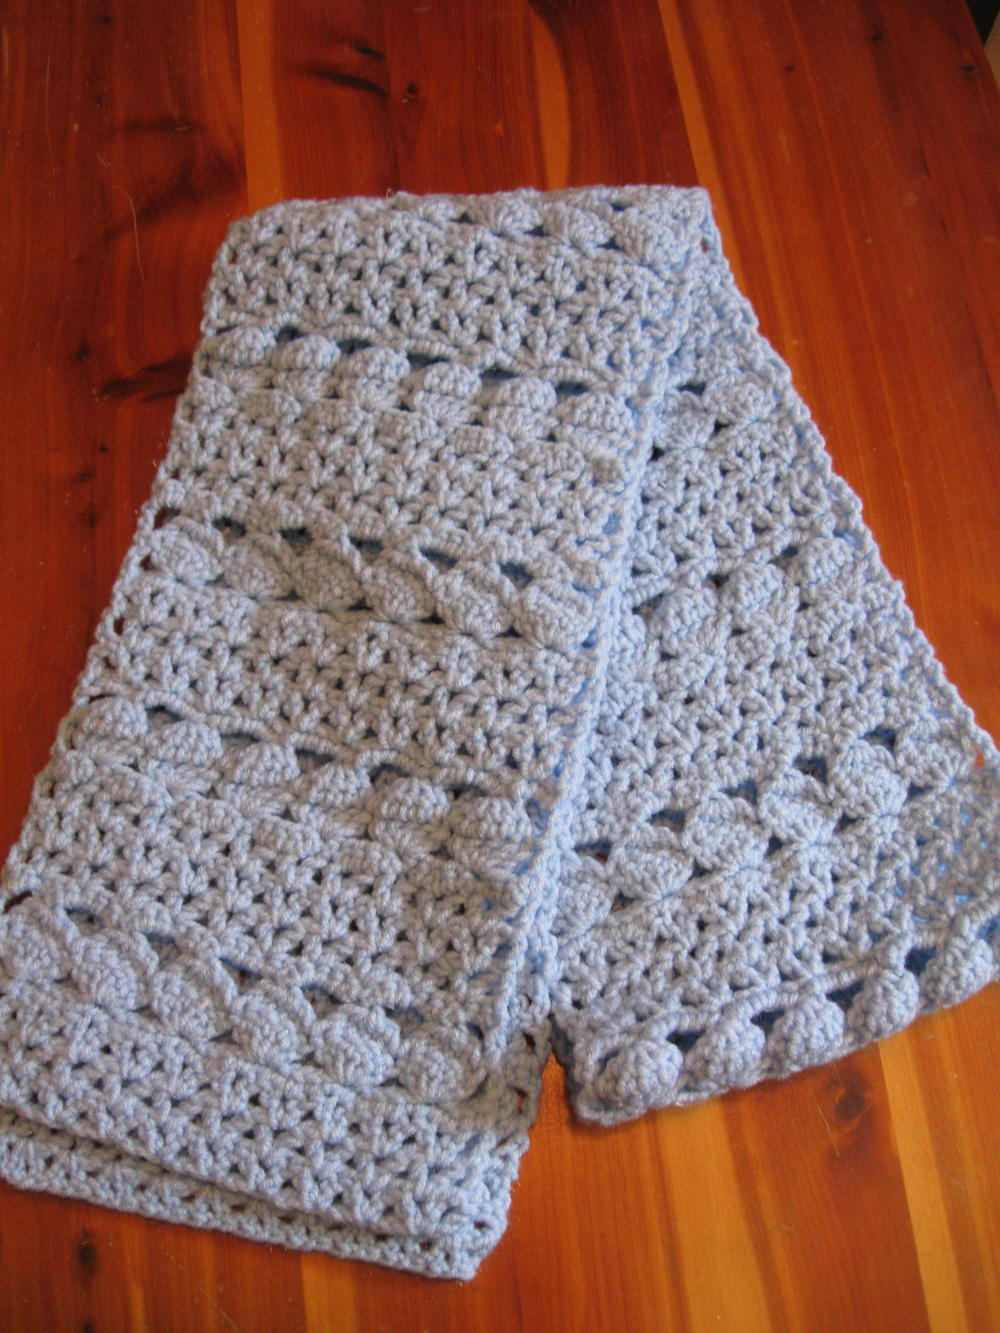 Cozy Blue Crochet Scarf AllFreeCrochet.com